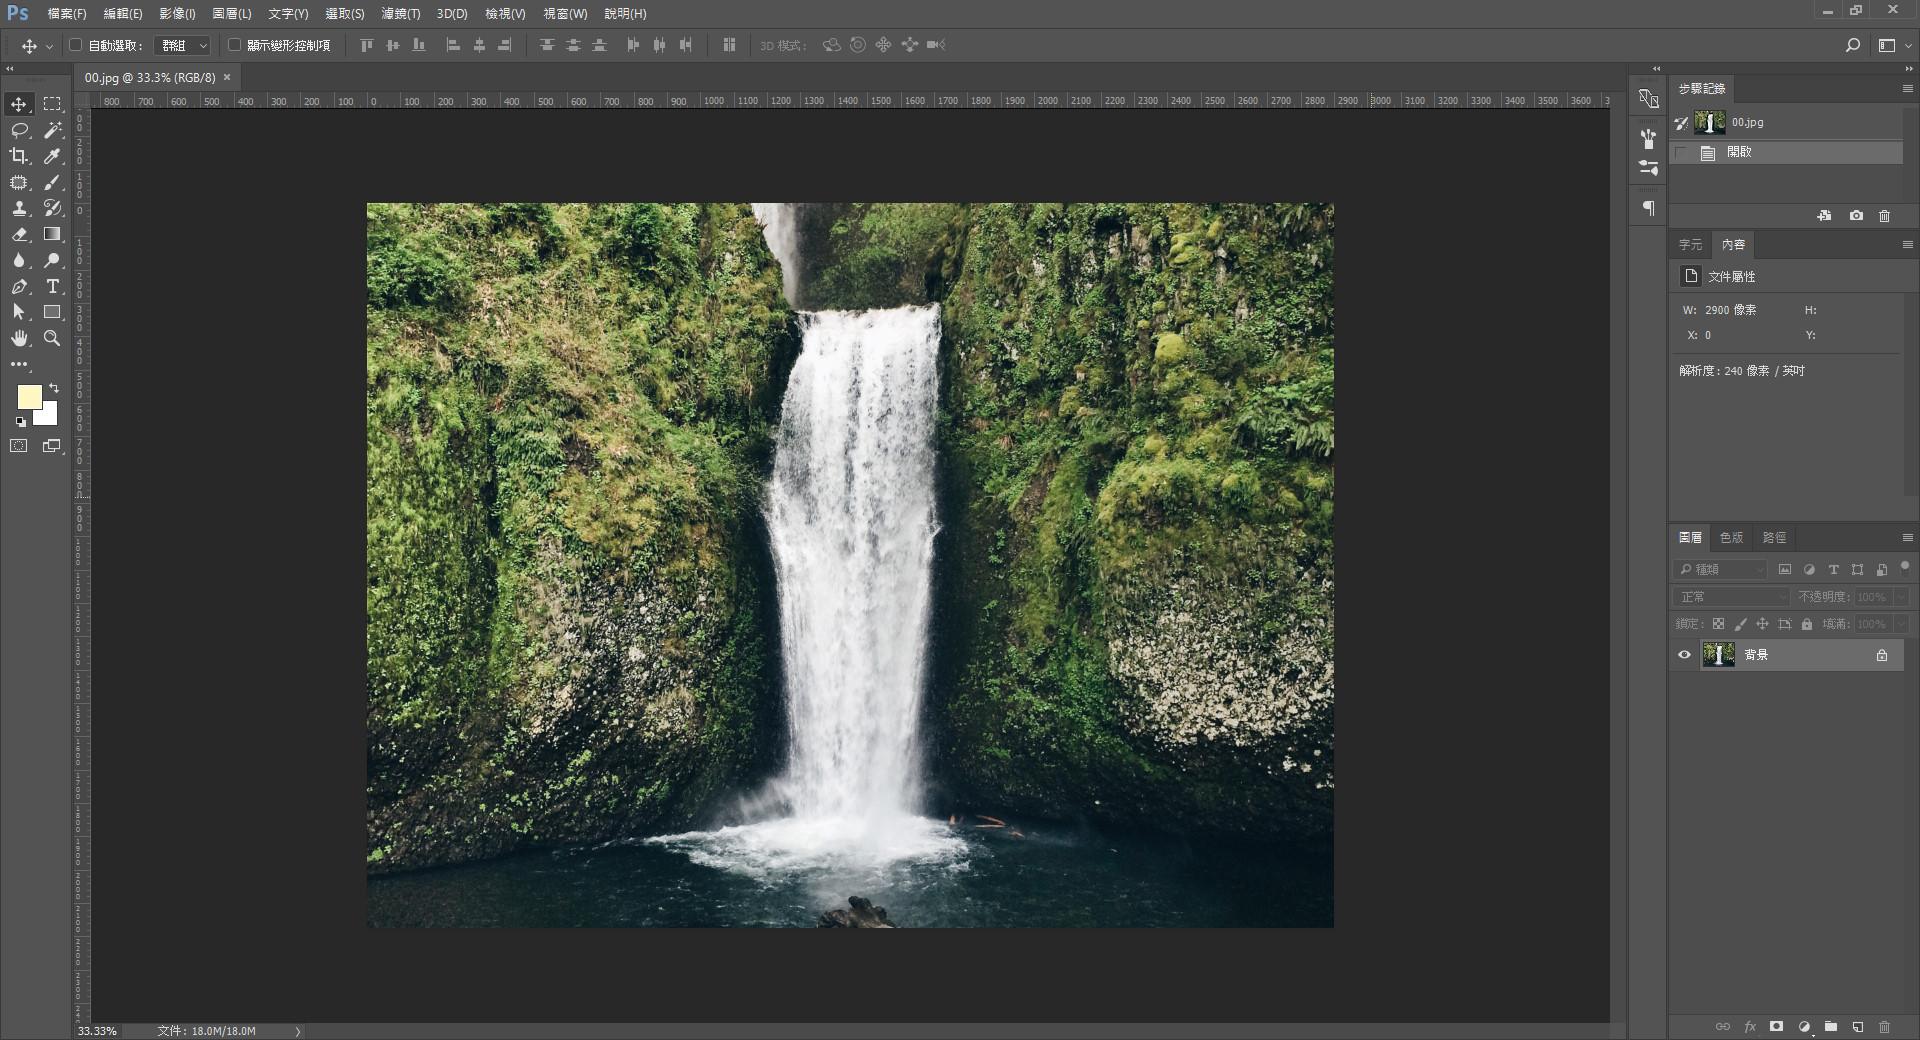 Photoshop - Path Blur Tool (21)